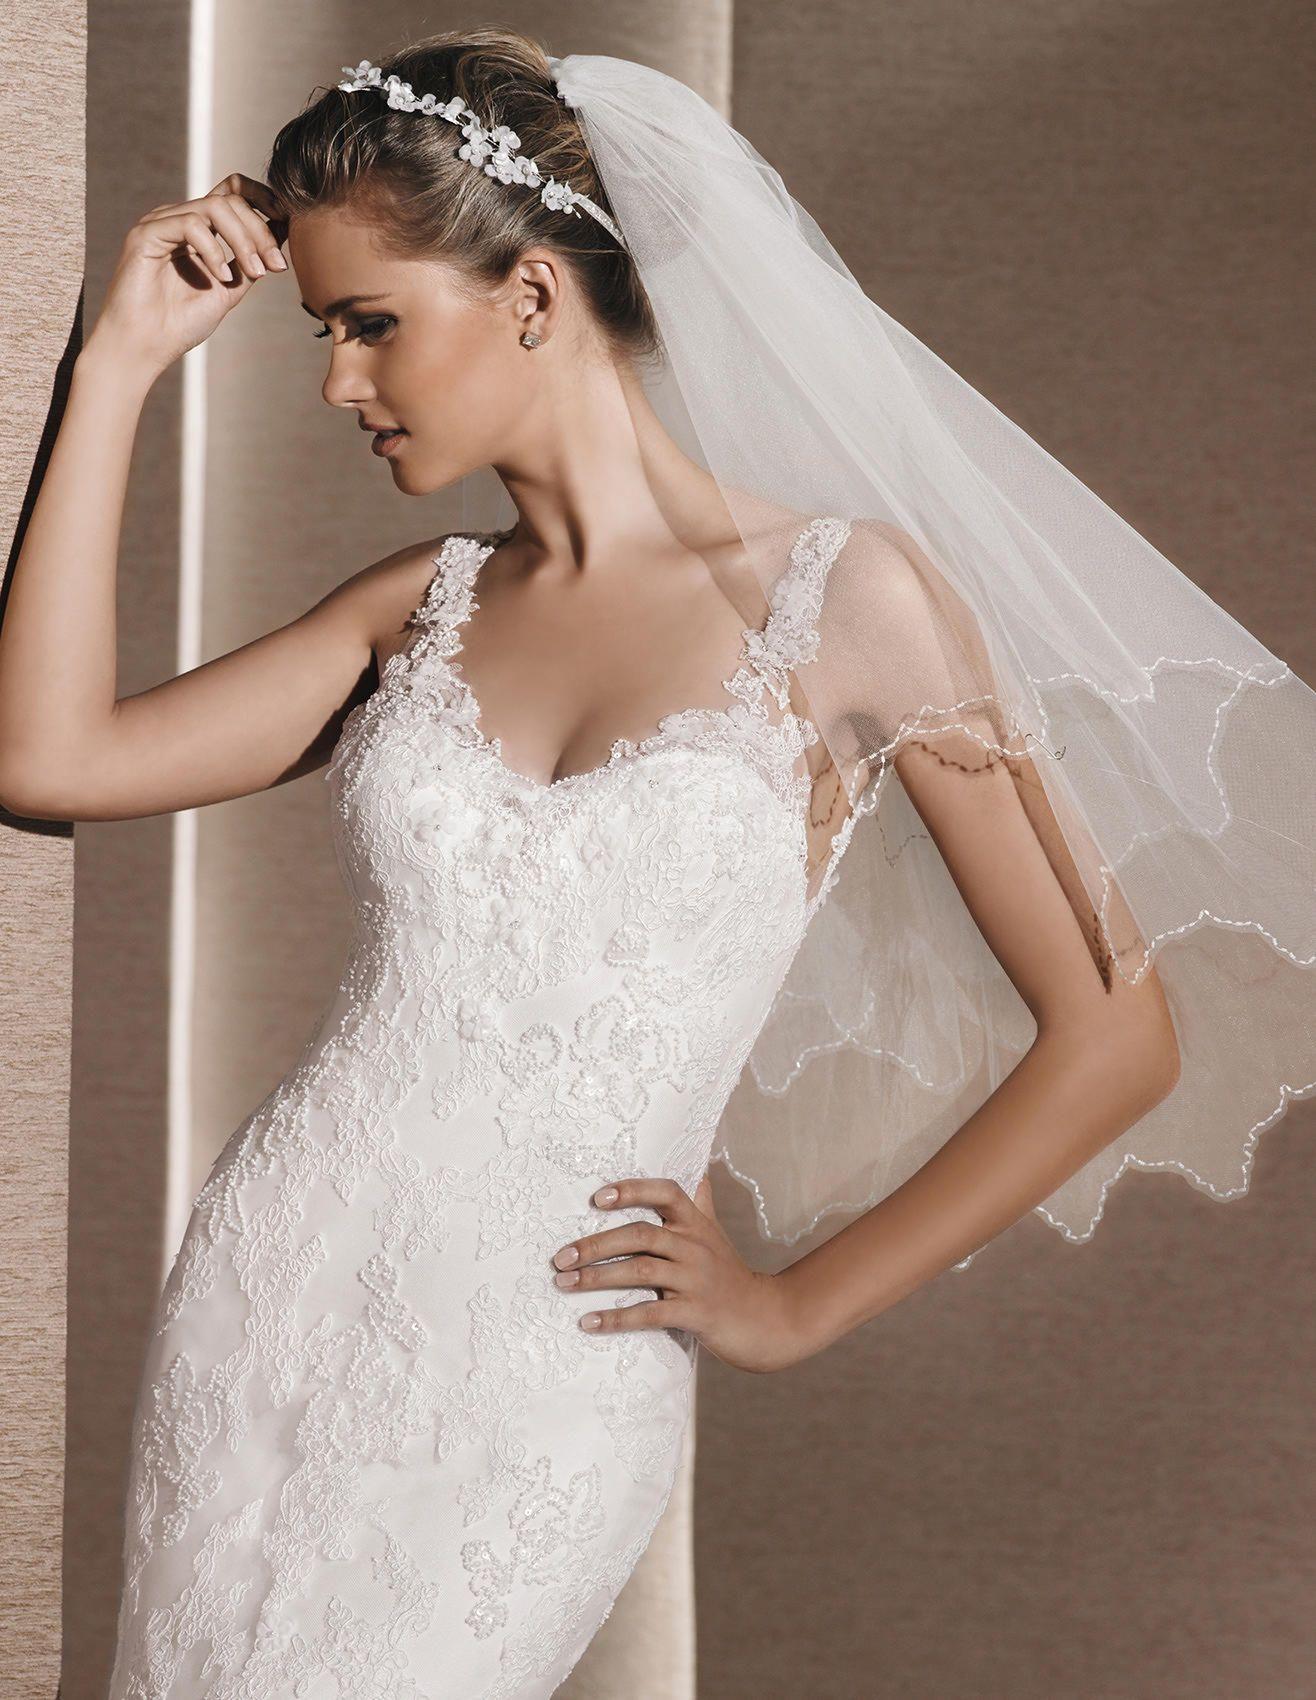 La Sposa Romantica Mermaid Wedding Dress With Plunging Back Short Veils Bridal Tulle Wedding Veil Wedding Dresses [ 1700 x 1316 Pixel ]